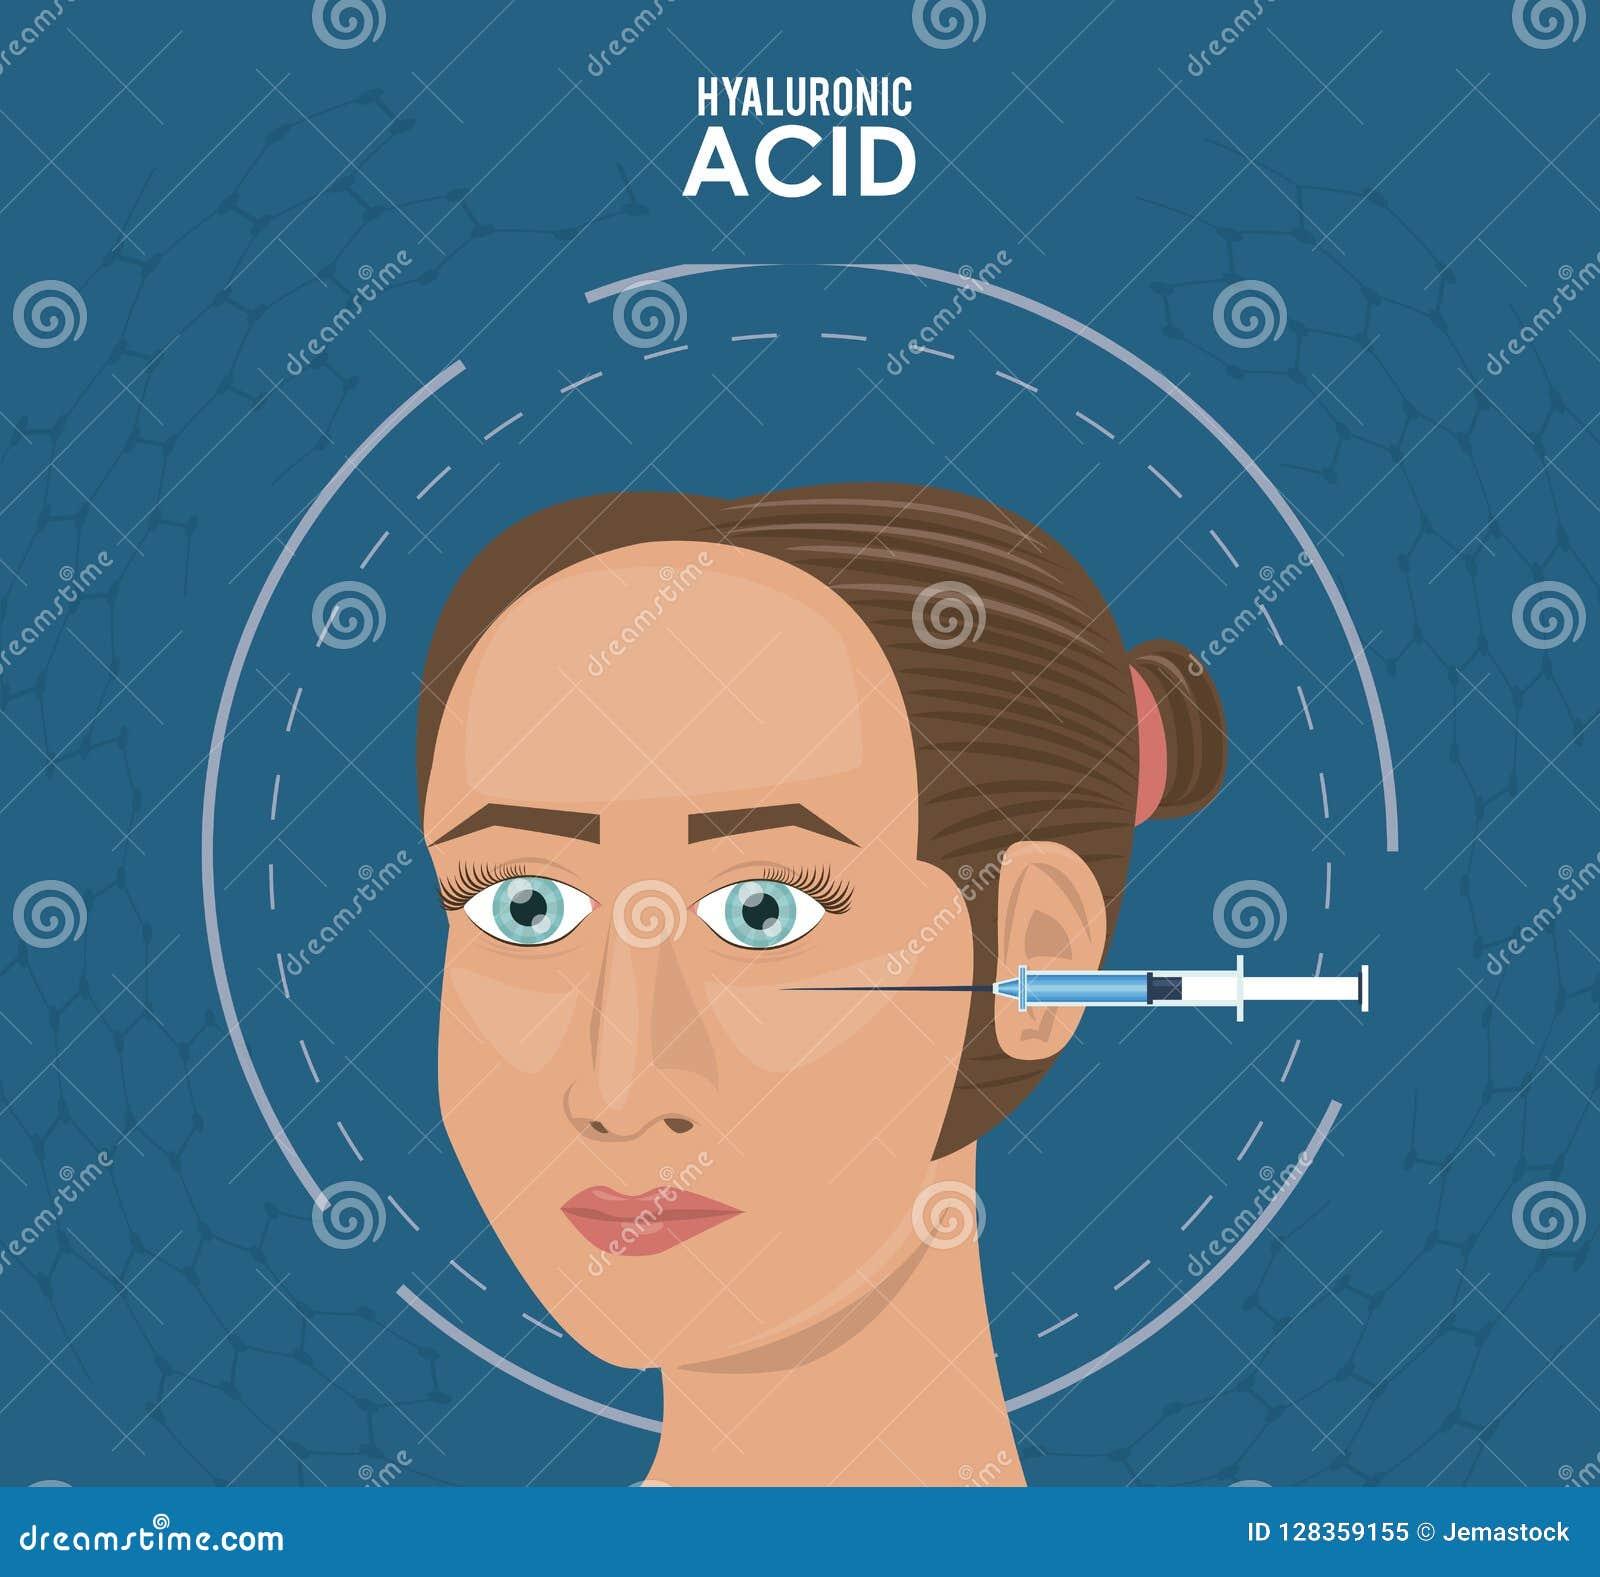 Hyaluronic Acid Filler Injection Infographic Flyer Stock Vector